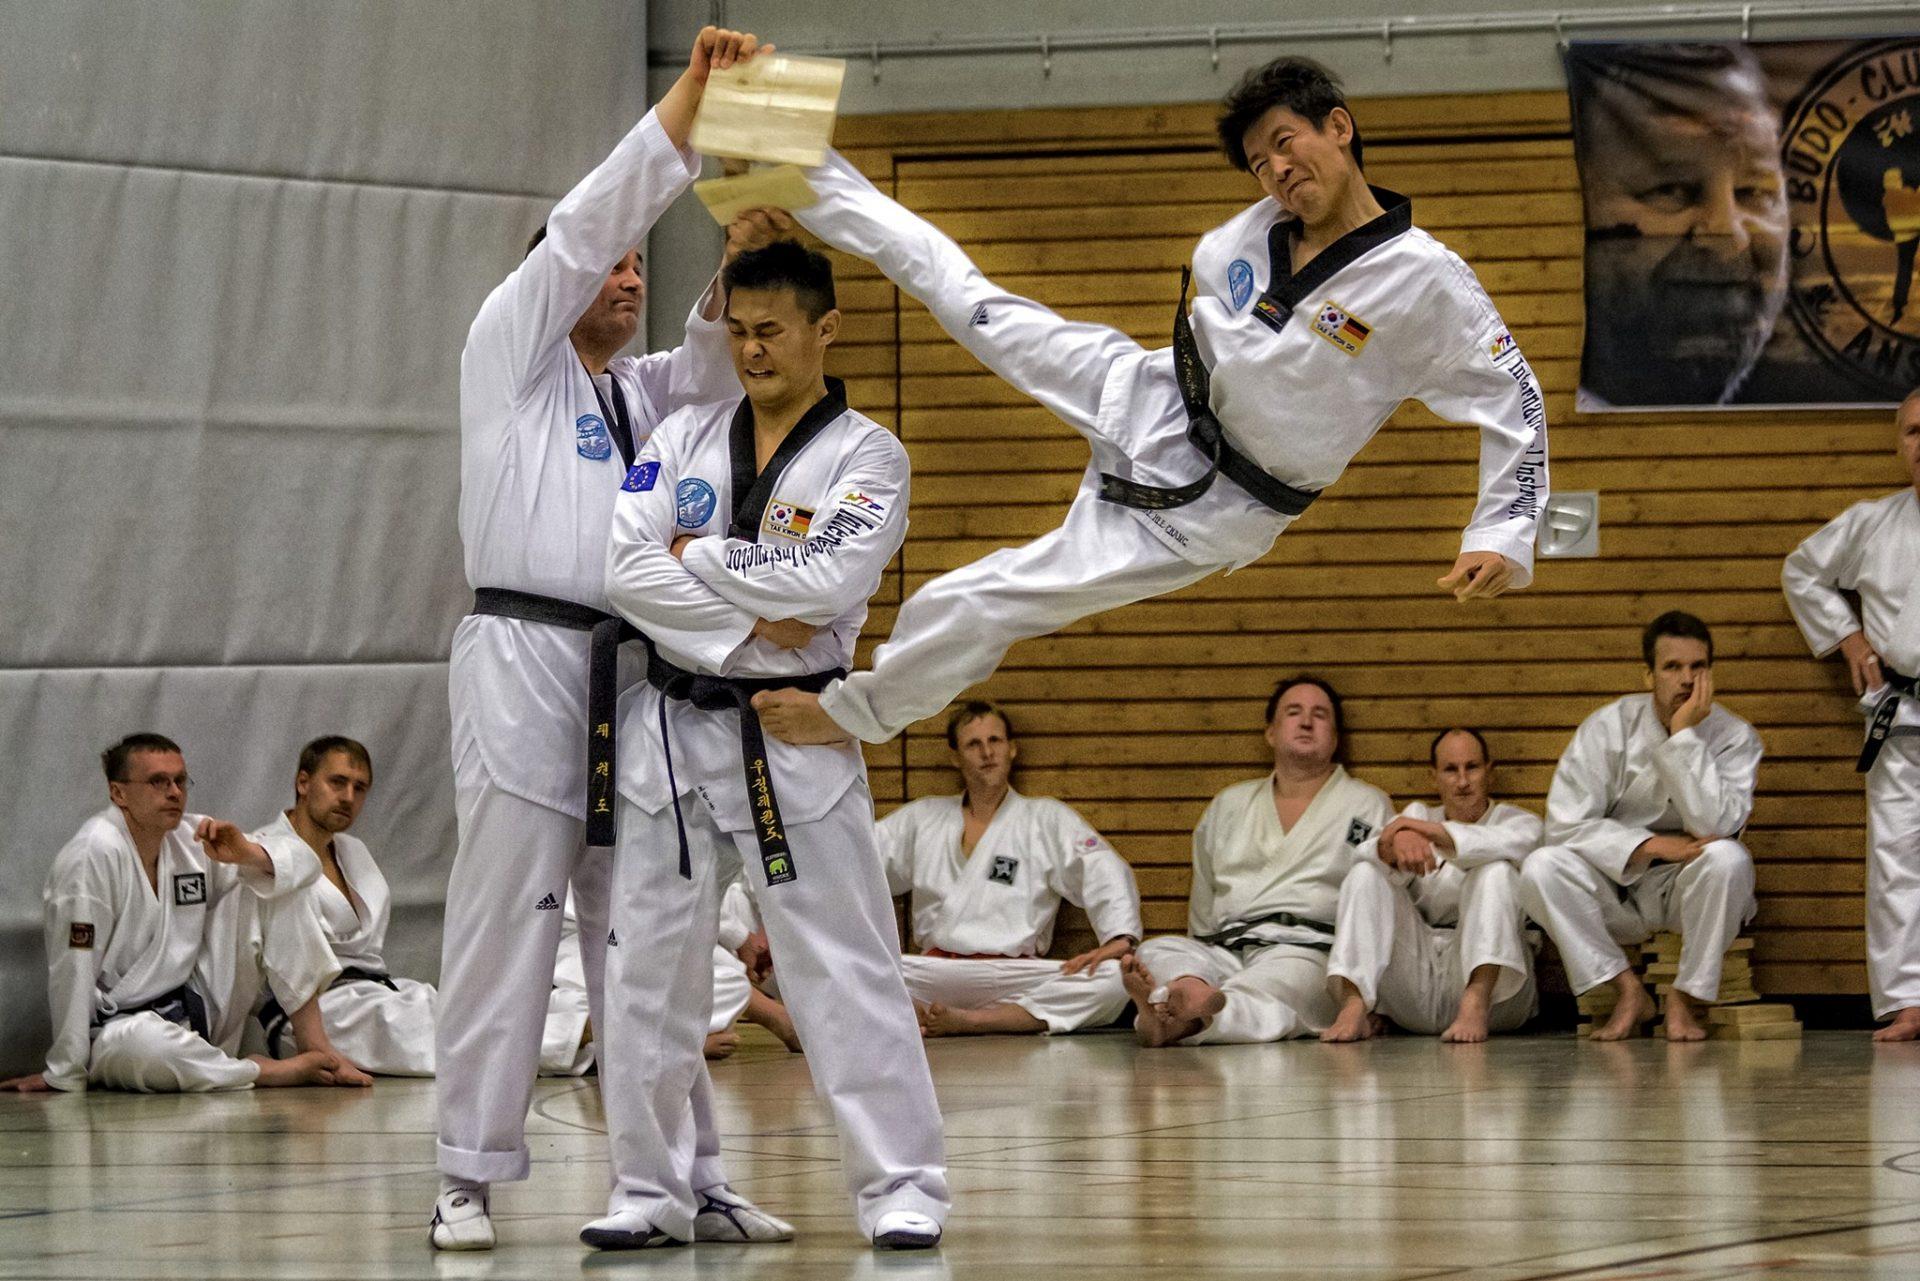 Sportfotografie - Kampfsport